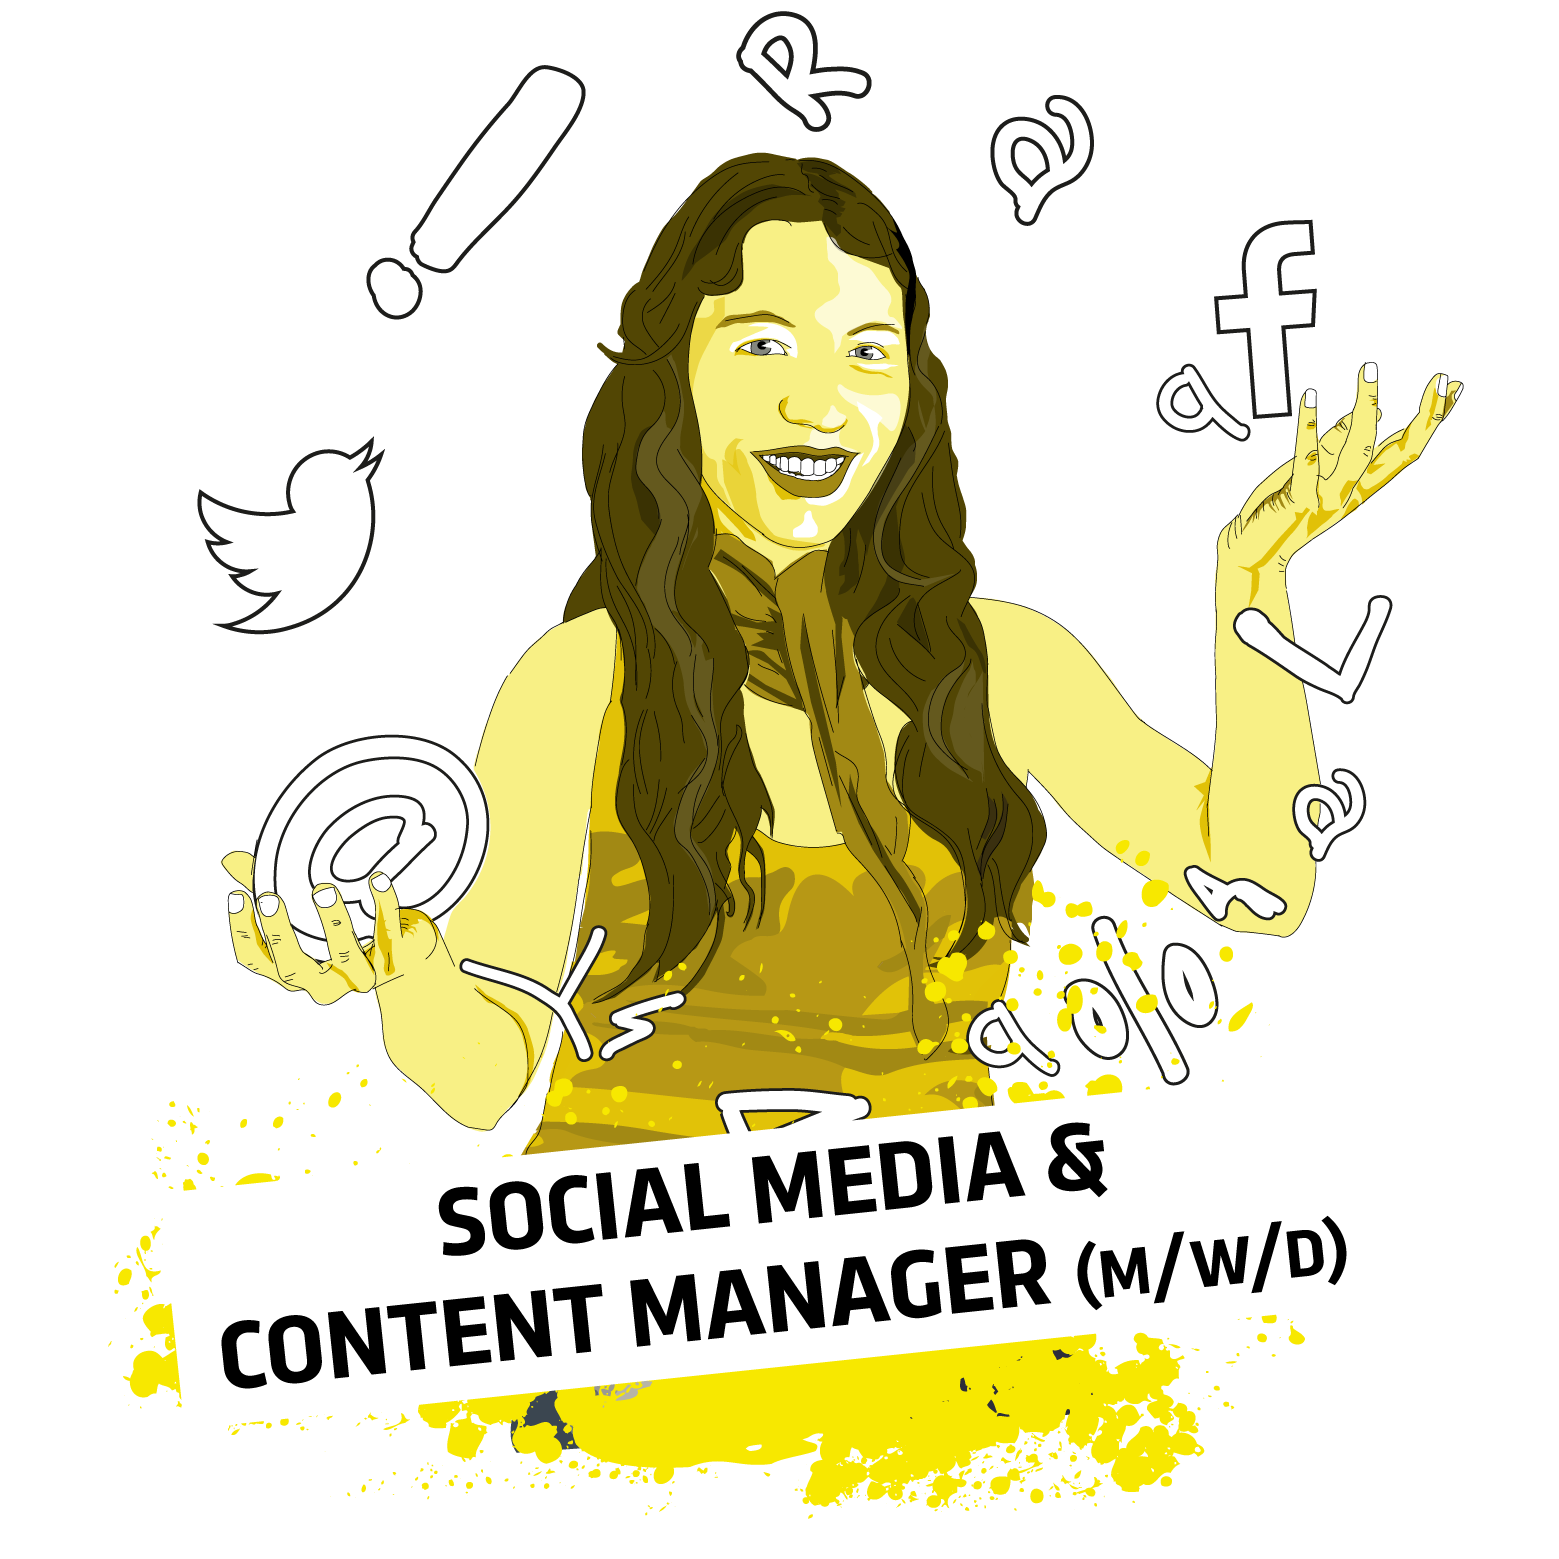 Social Media & Content Manager bei Blackbit